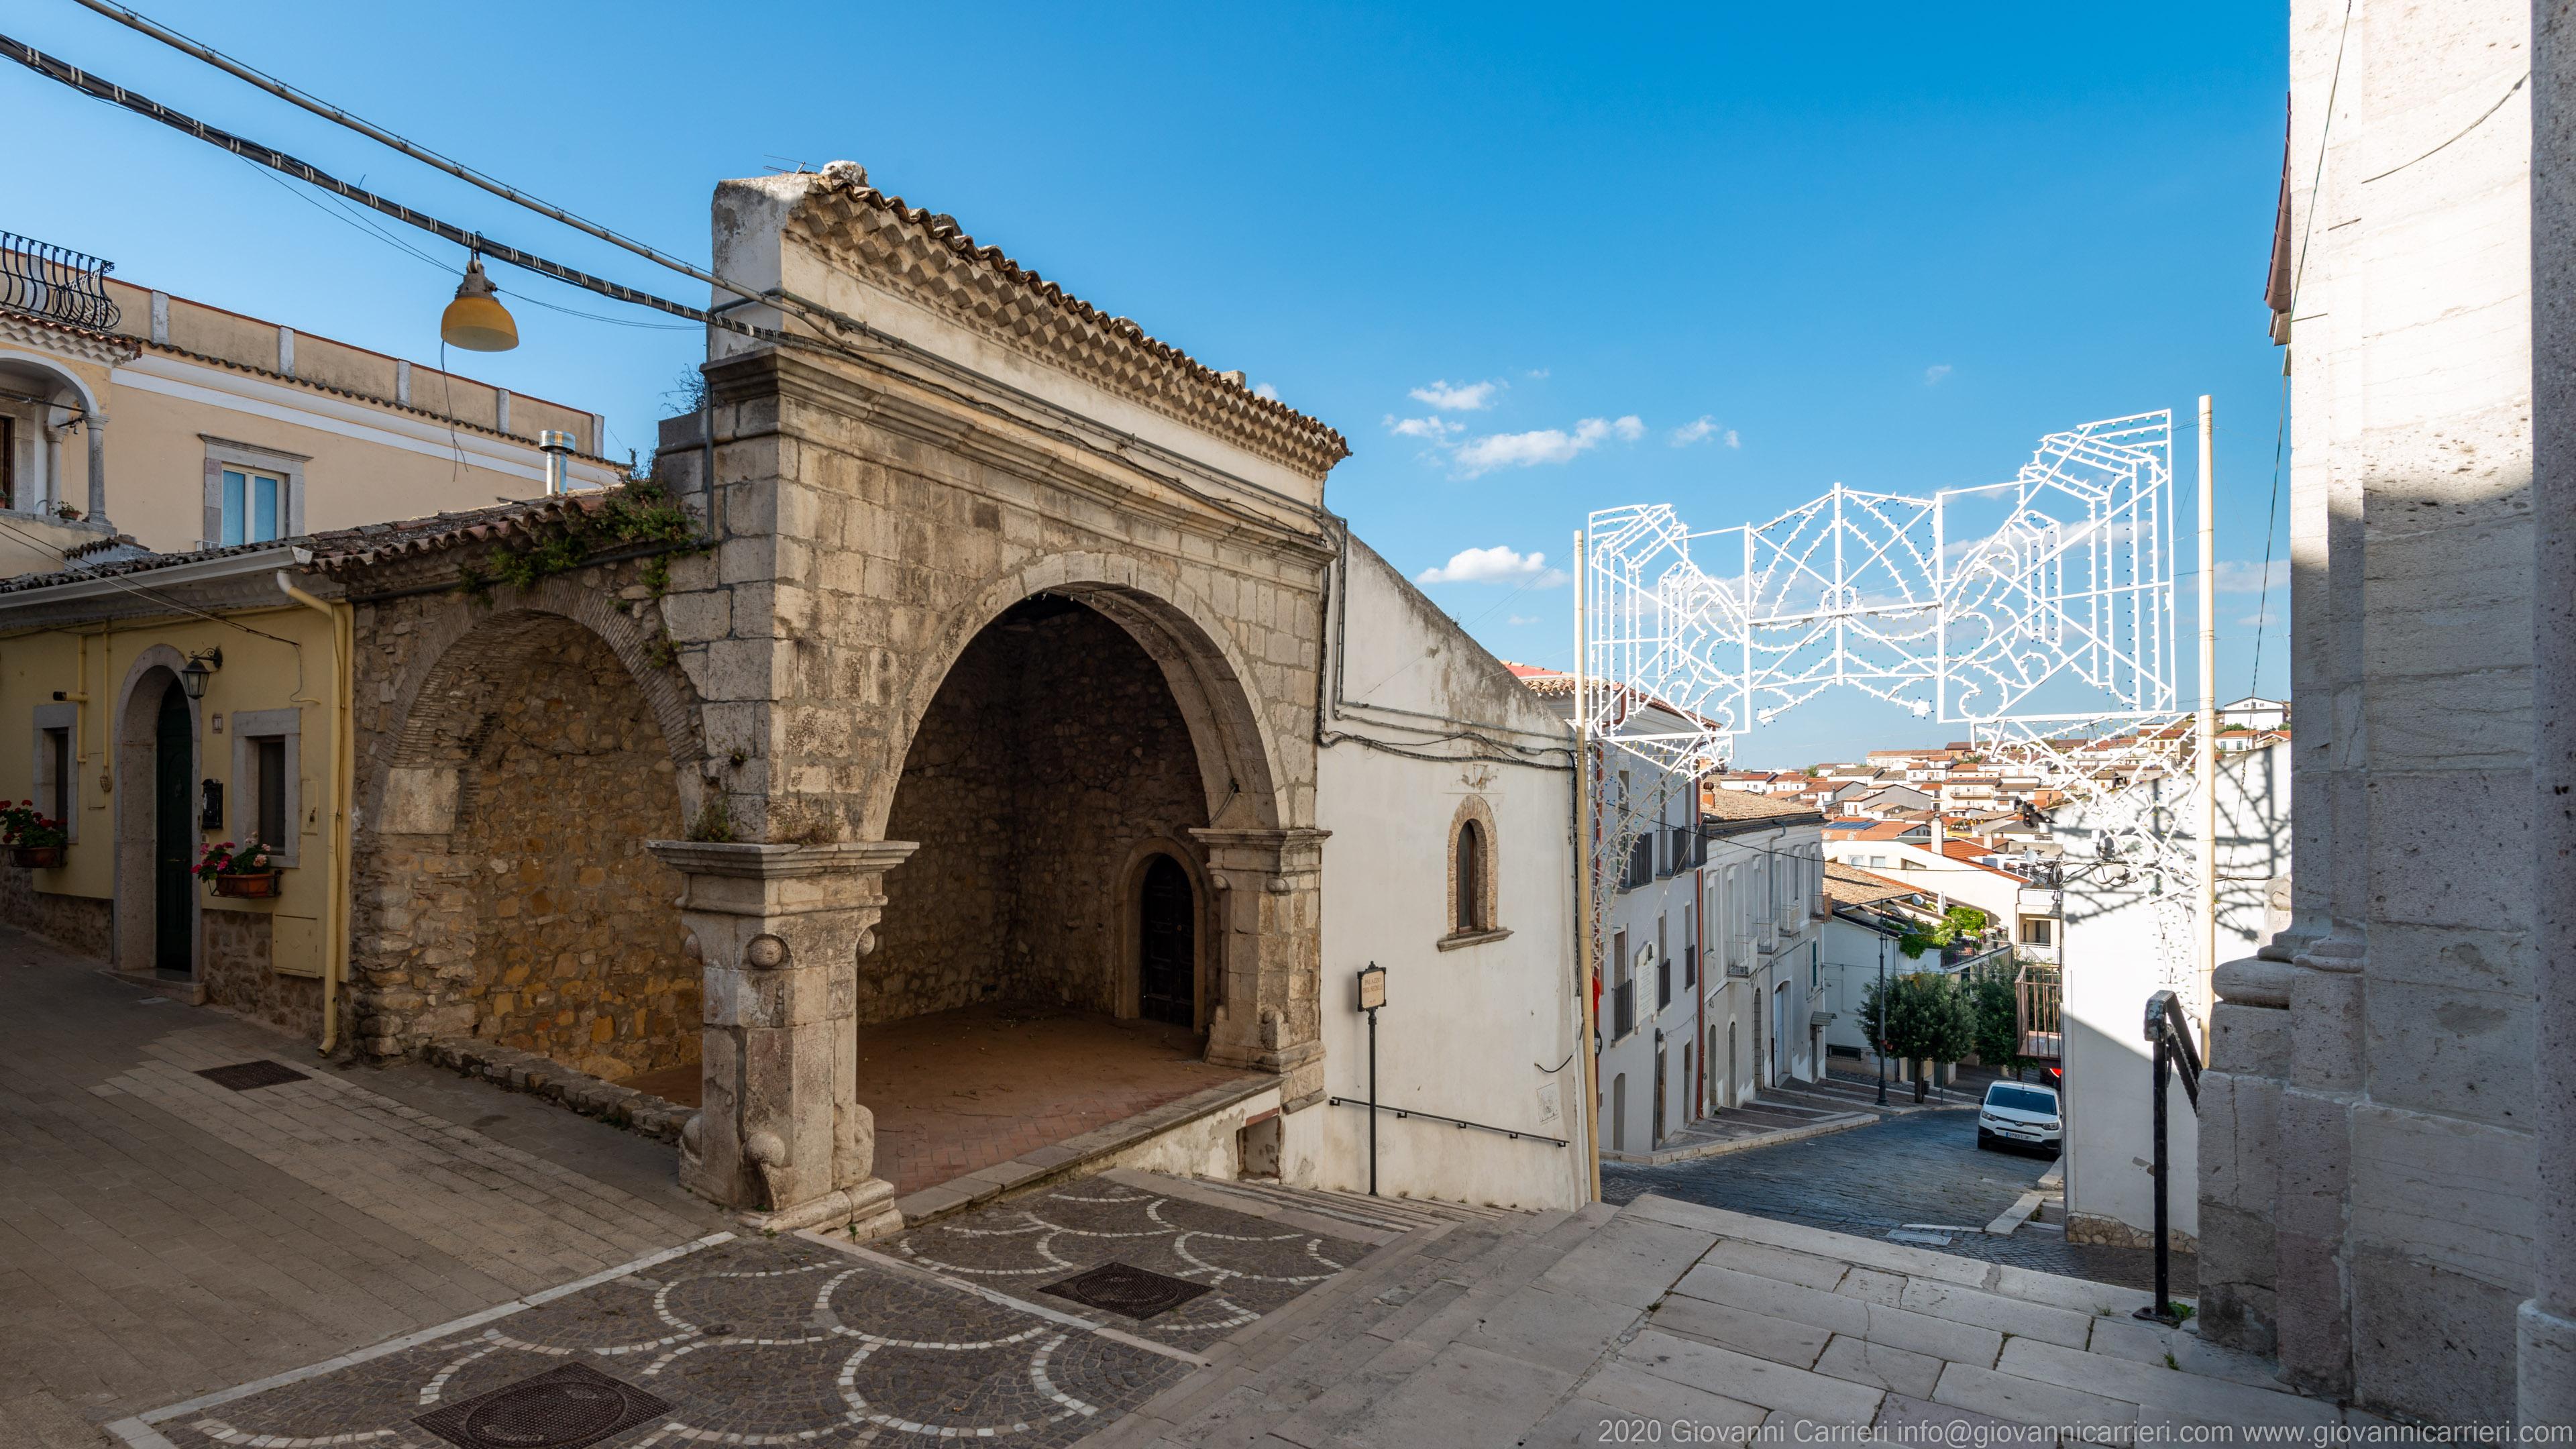 Rocchetta Sant'Antonio L'ingresso al borgo antico di Rocchetta Sant'Antonio